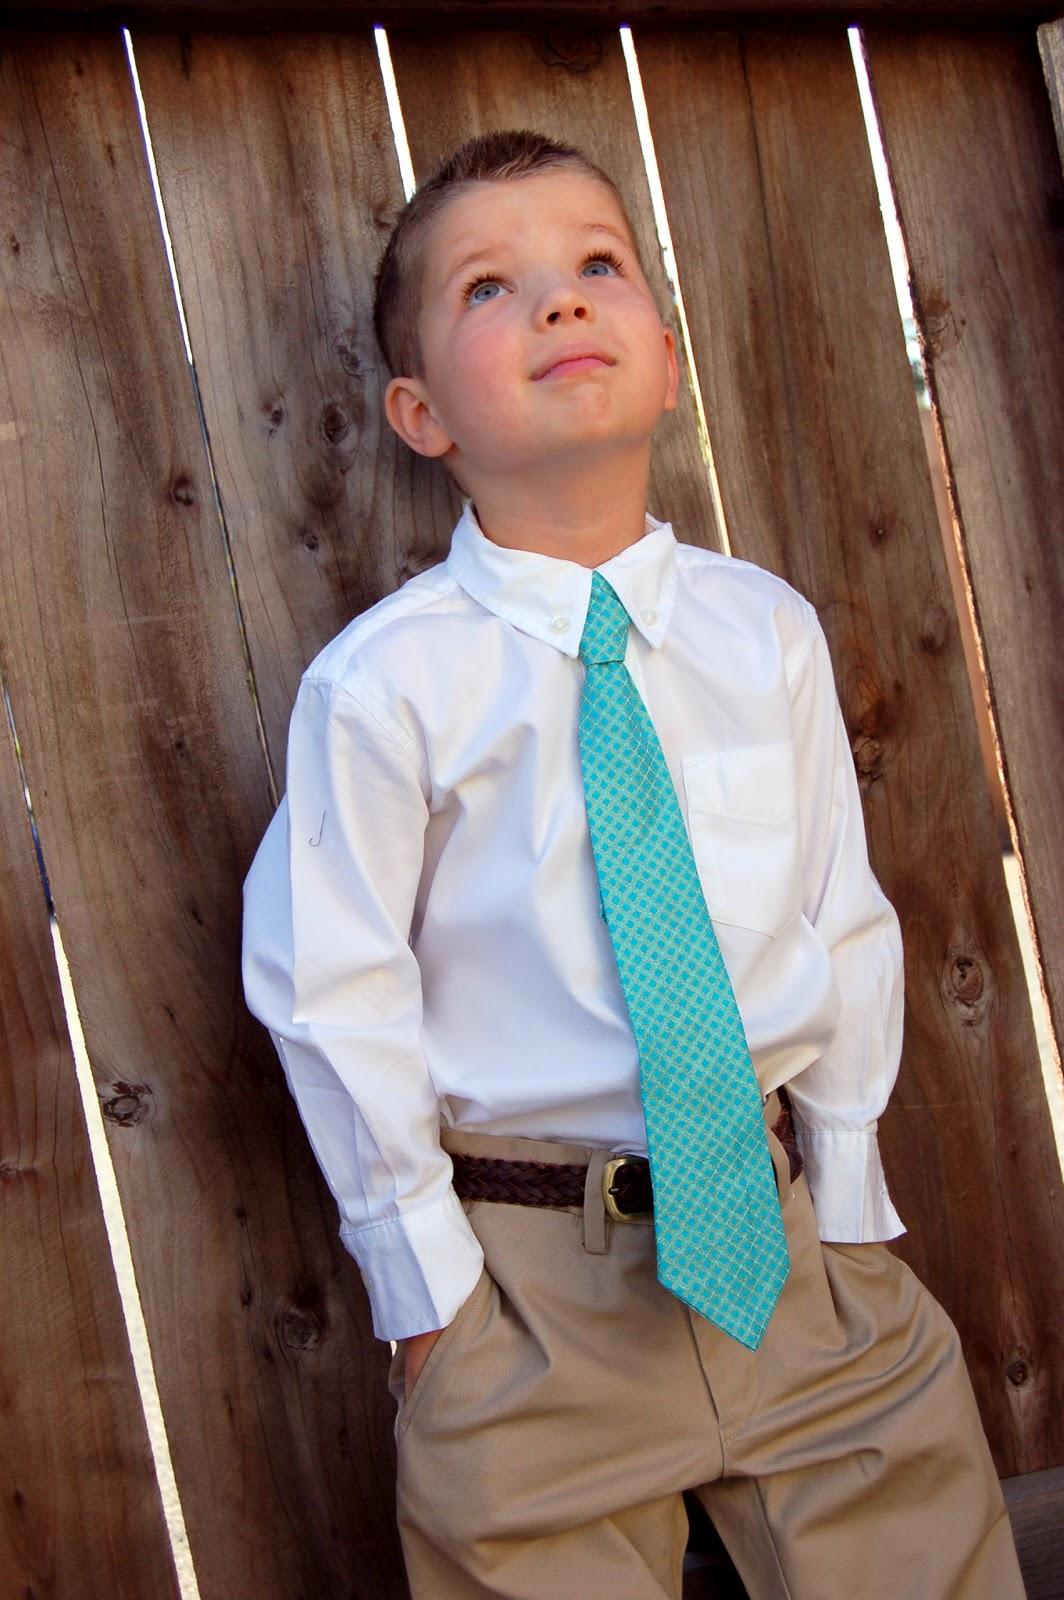 faux tie tutorial for boys {guest post} | Little Birdie ...